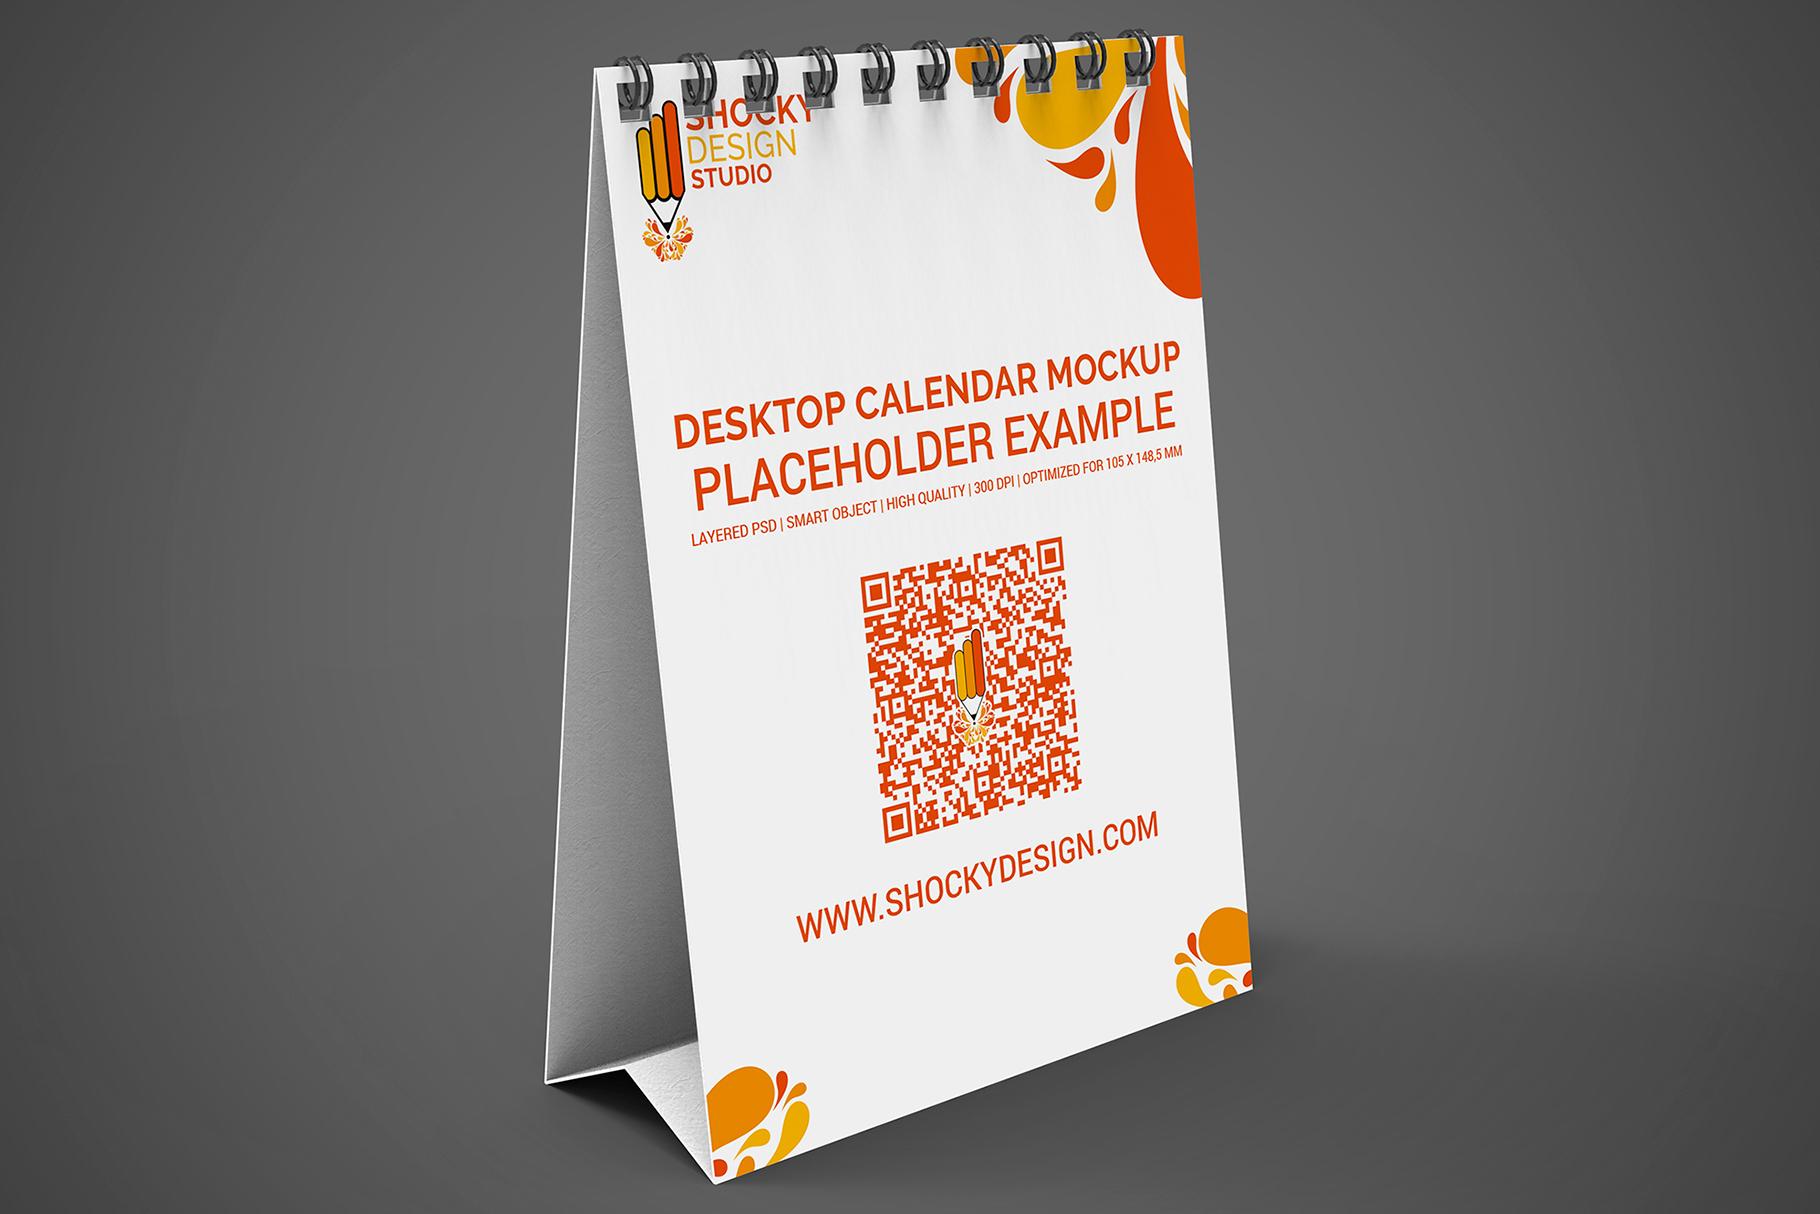 Desktop Calendar A6 Mockup example image 6